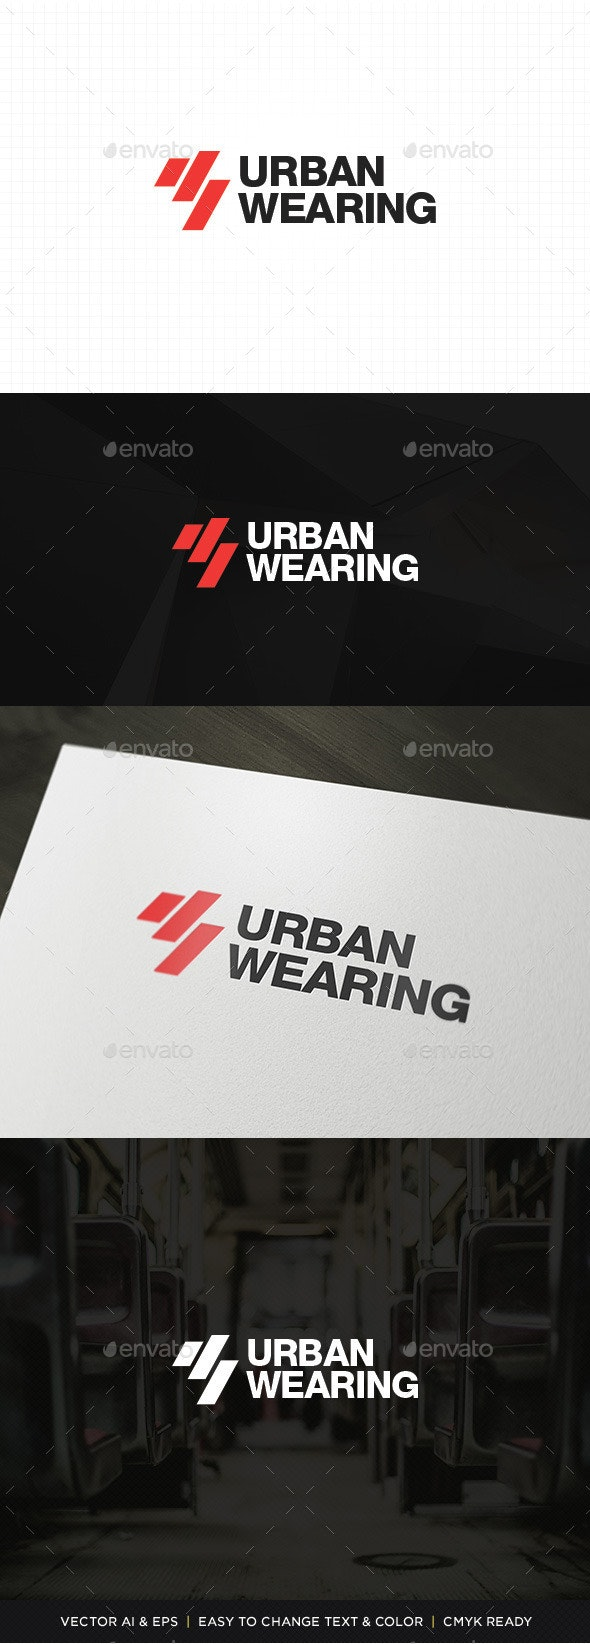 Urban Wearing Logo - Abstract Logo Templates